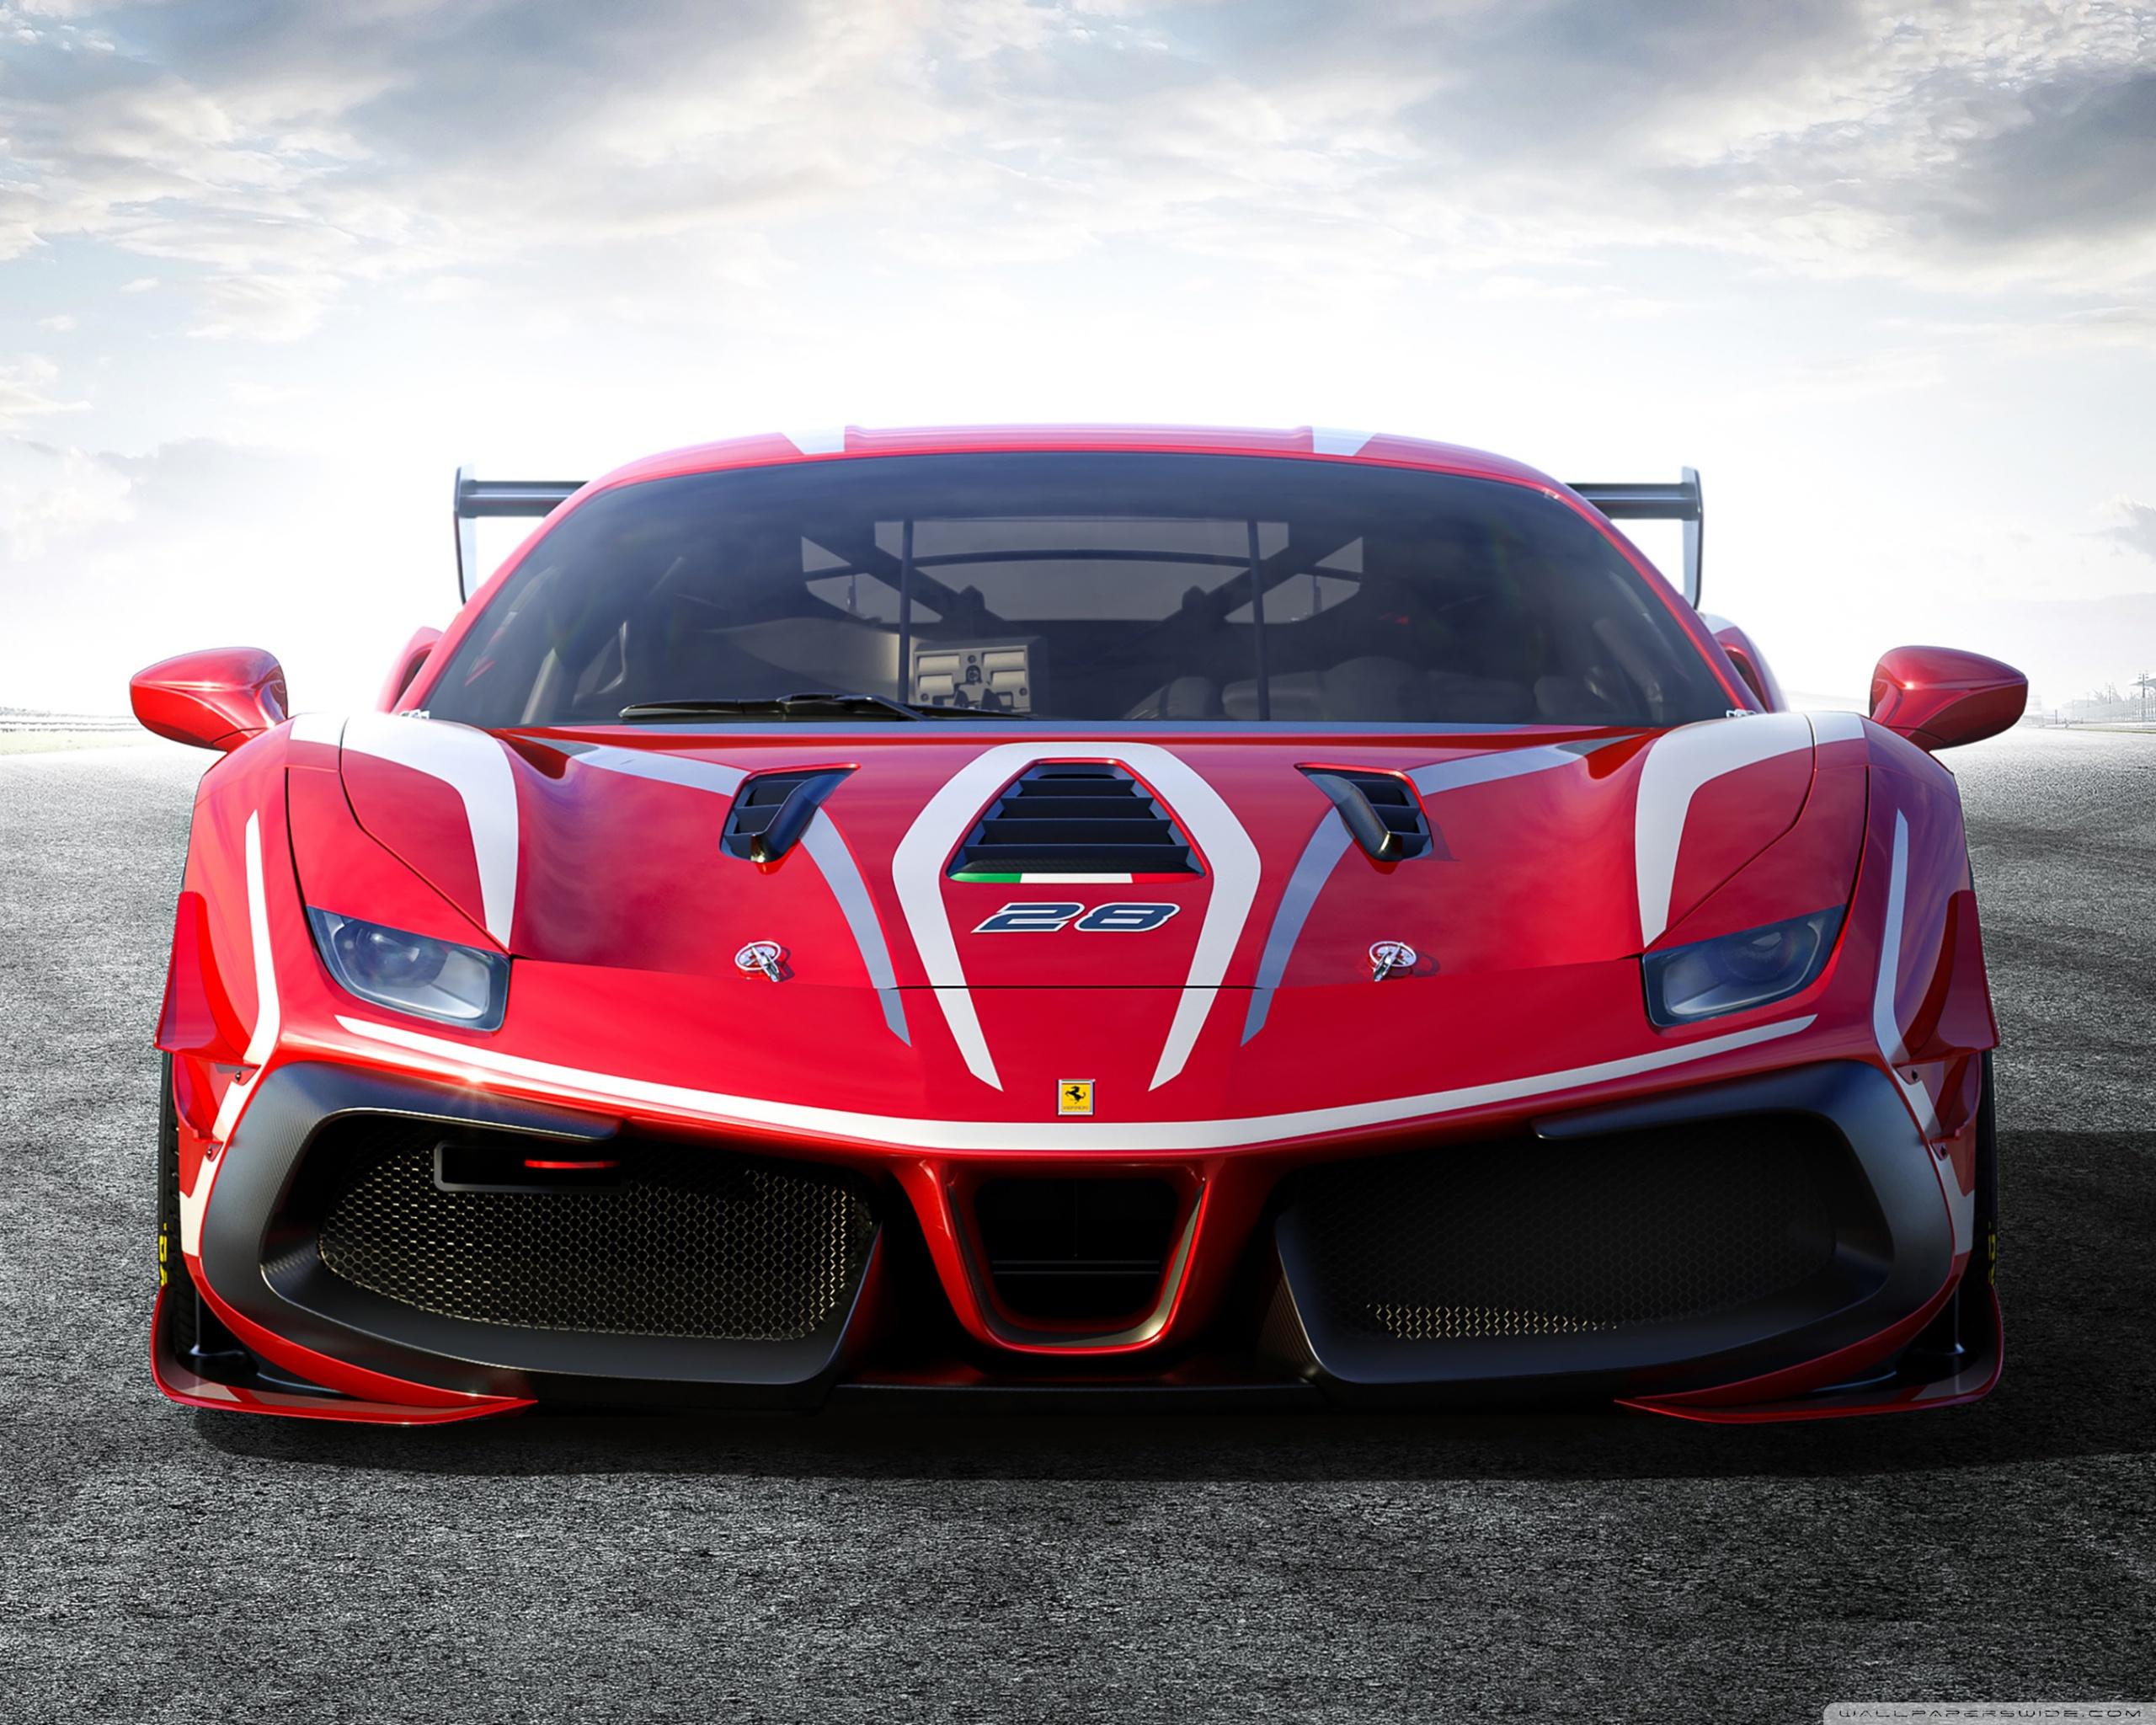 Ferrari 488 Challenge Evo Race Car 2020 Ultra HD Desktop 2560x2048